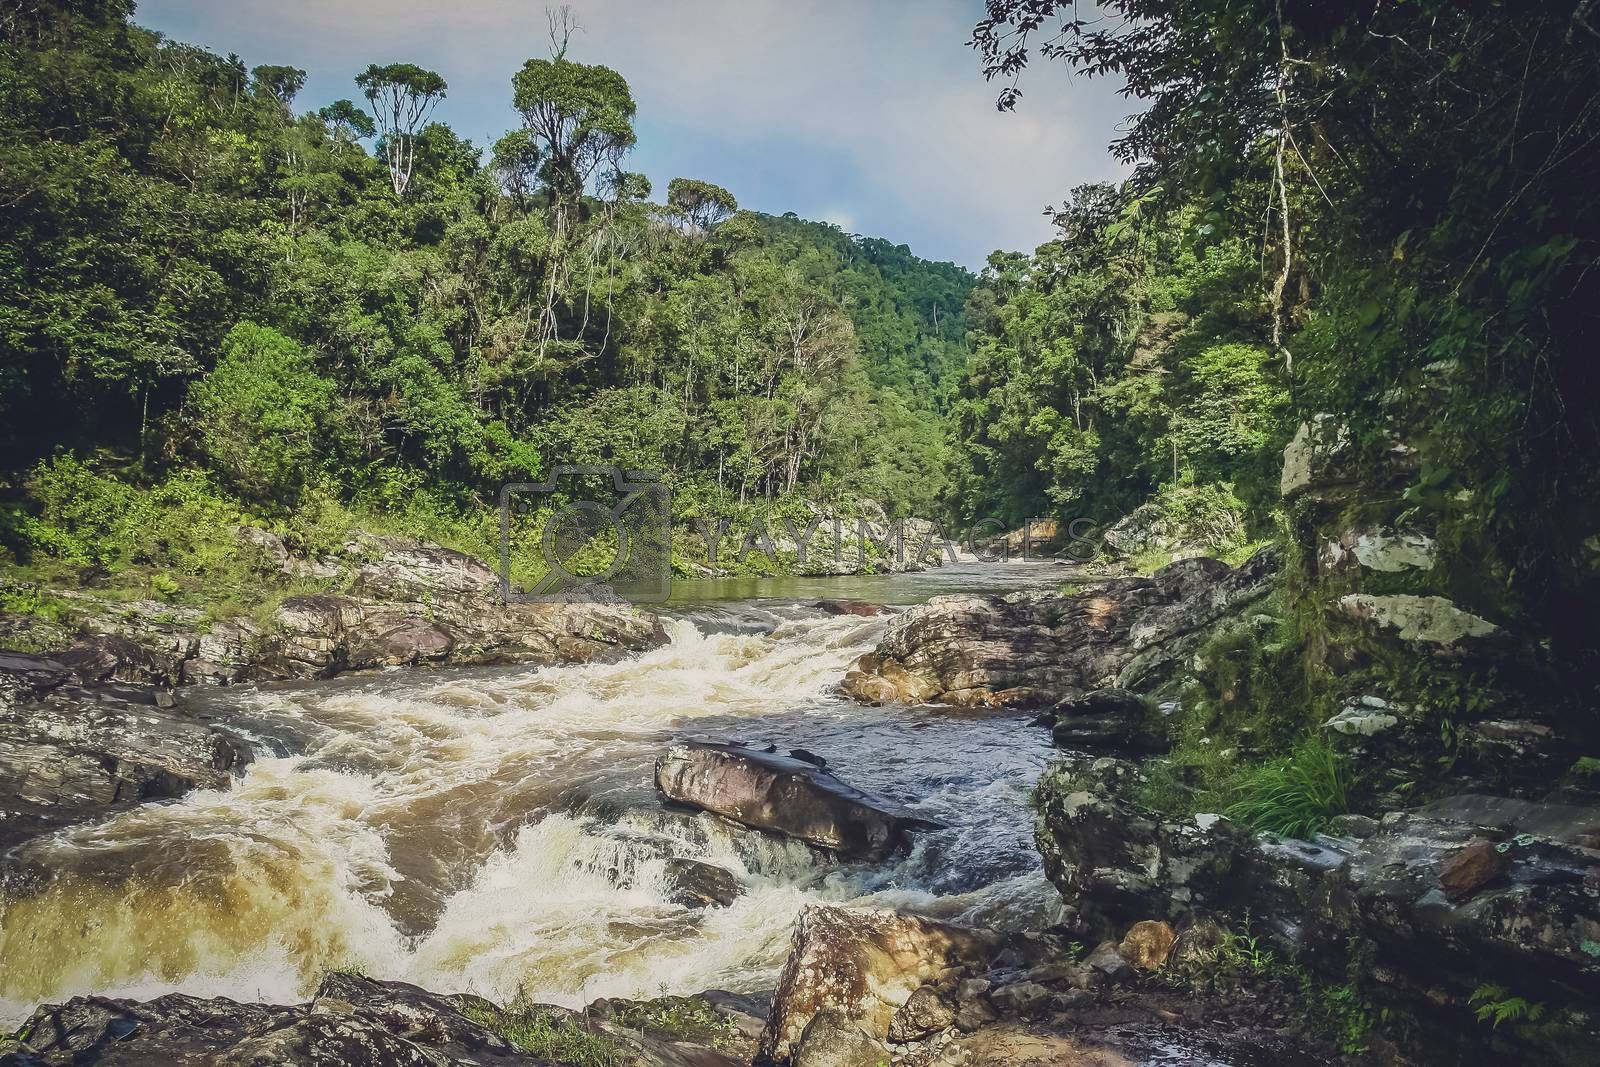 River flowing through Ranomafana National Park in Madagascar